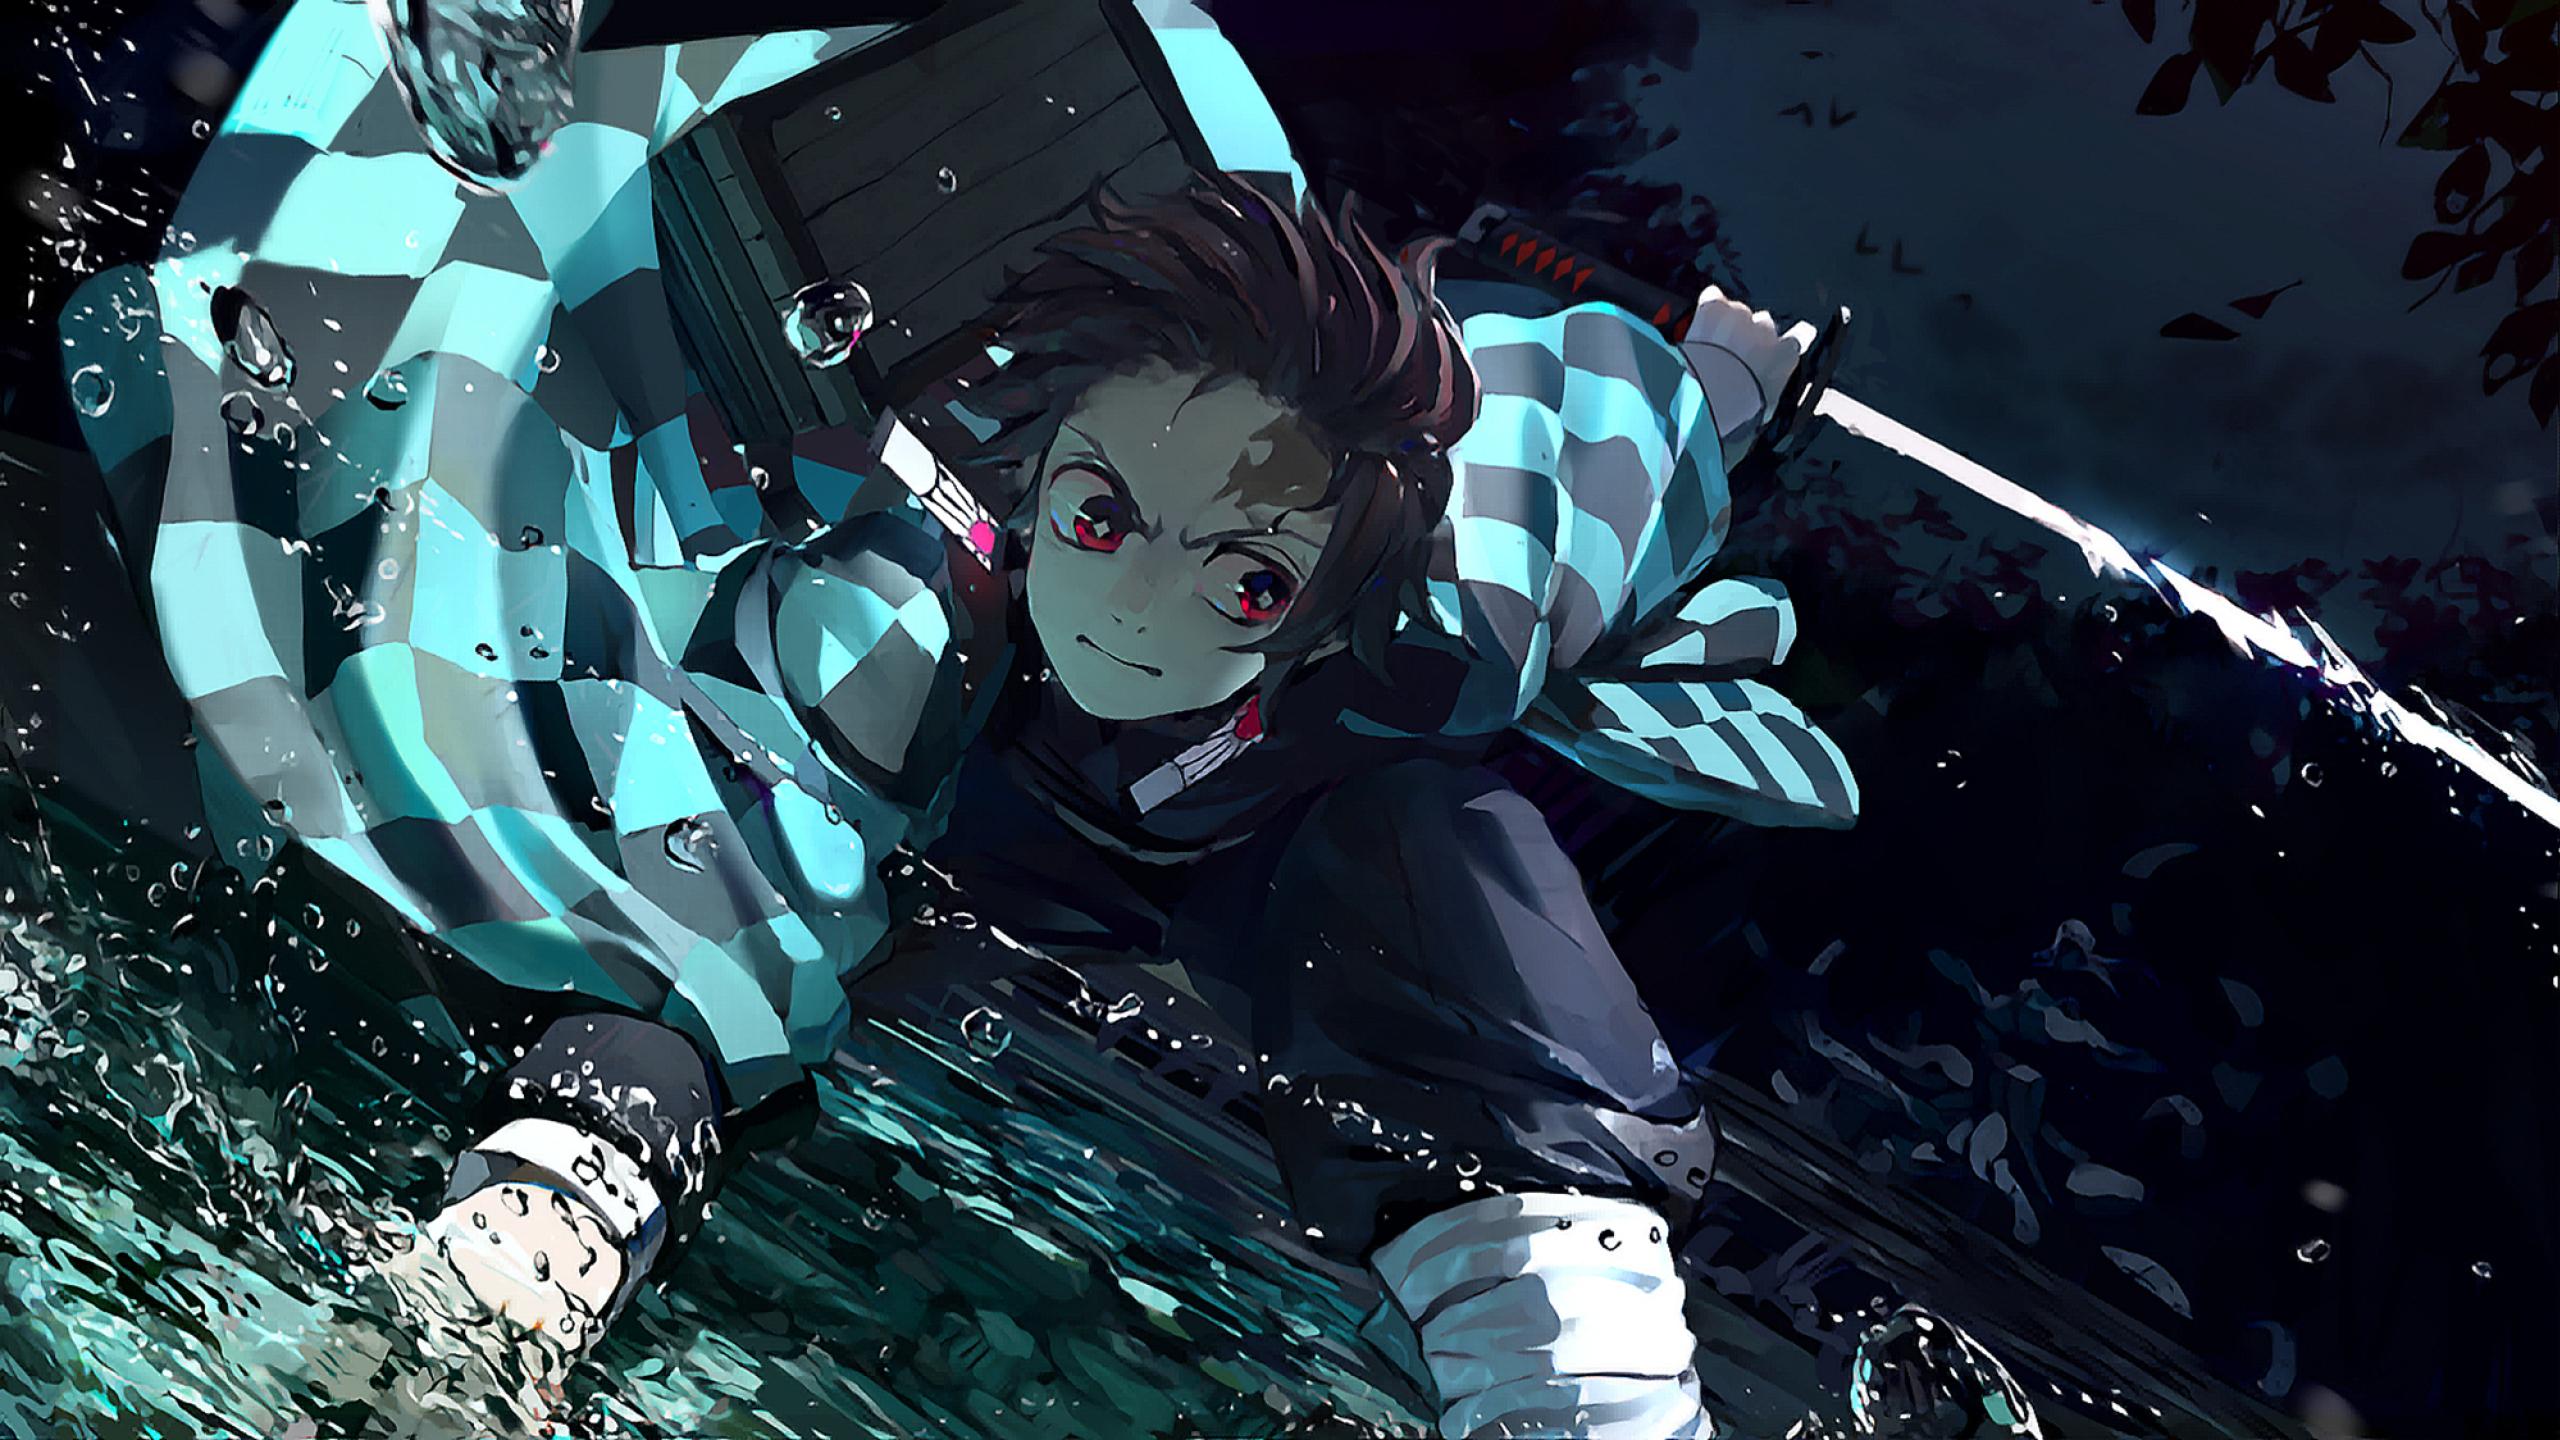 2560x1440 Demon Slayer Tanjirou Kamado 1440p Resolution Wallpaper Hd Anime 4k Wallpapers Images Photos And Background